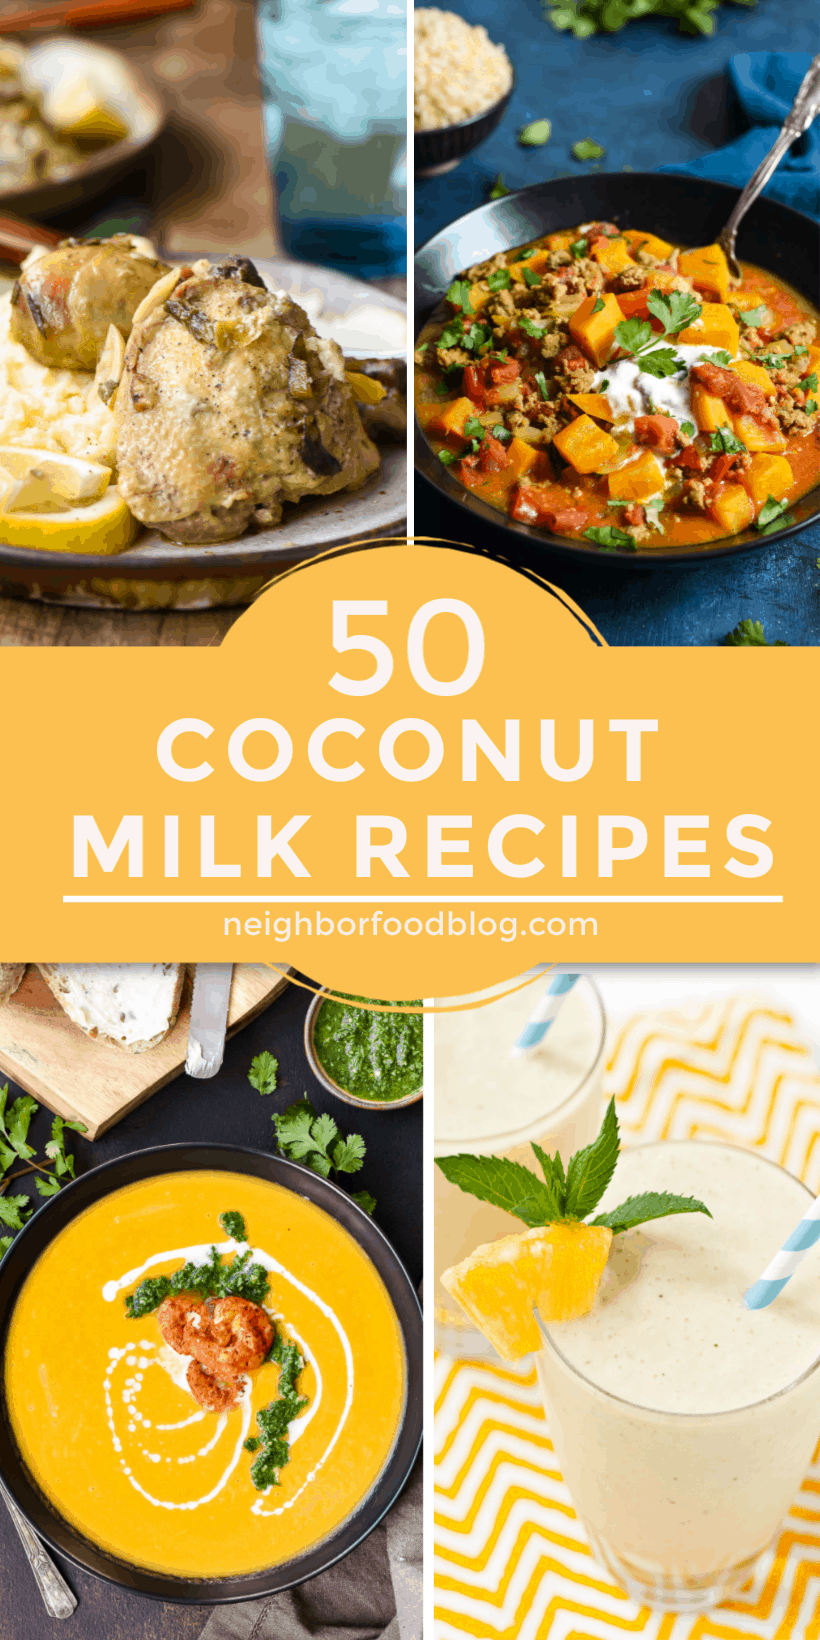 coconut milk recipes in a collage